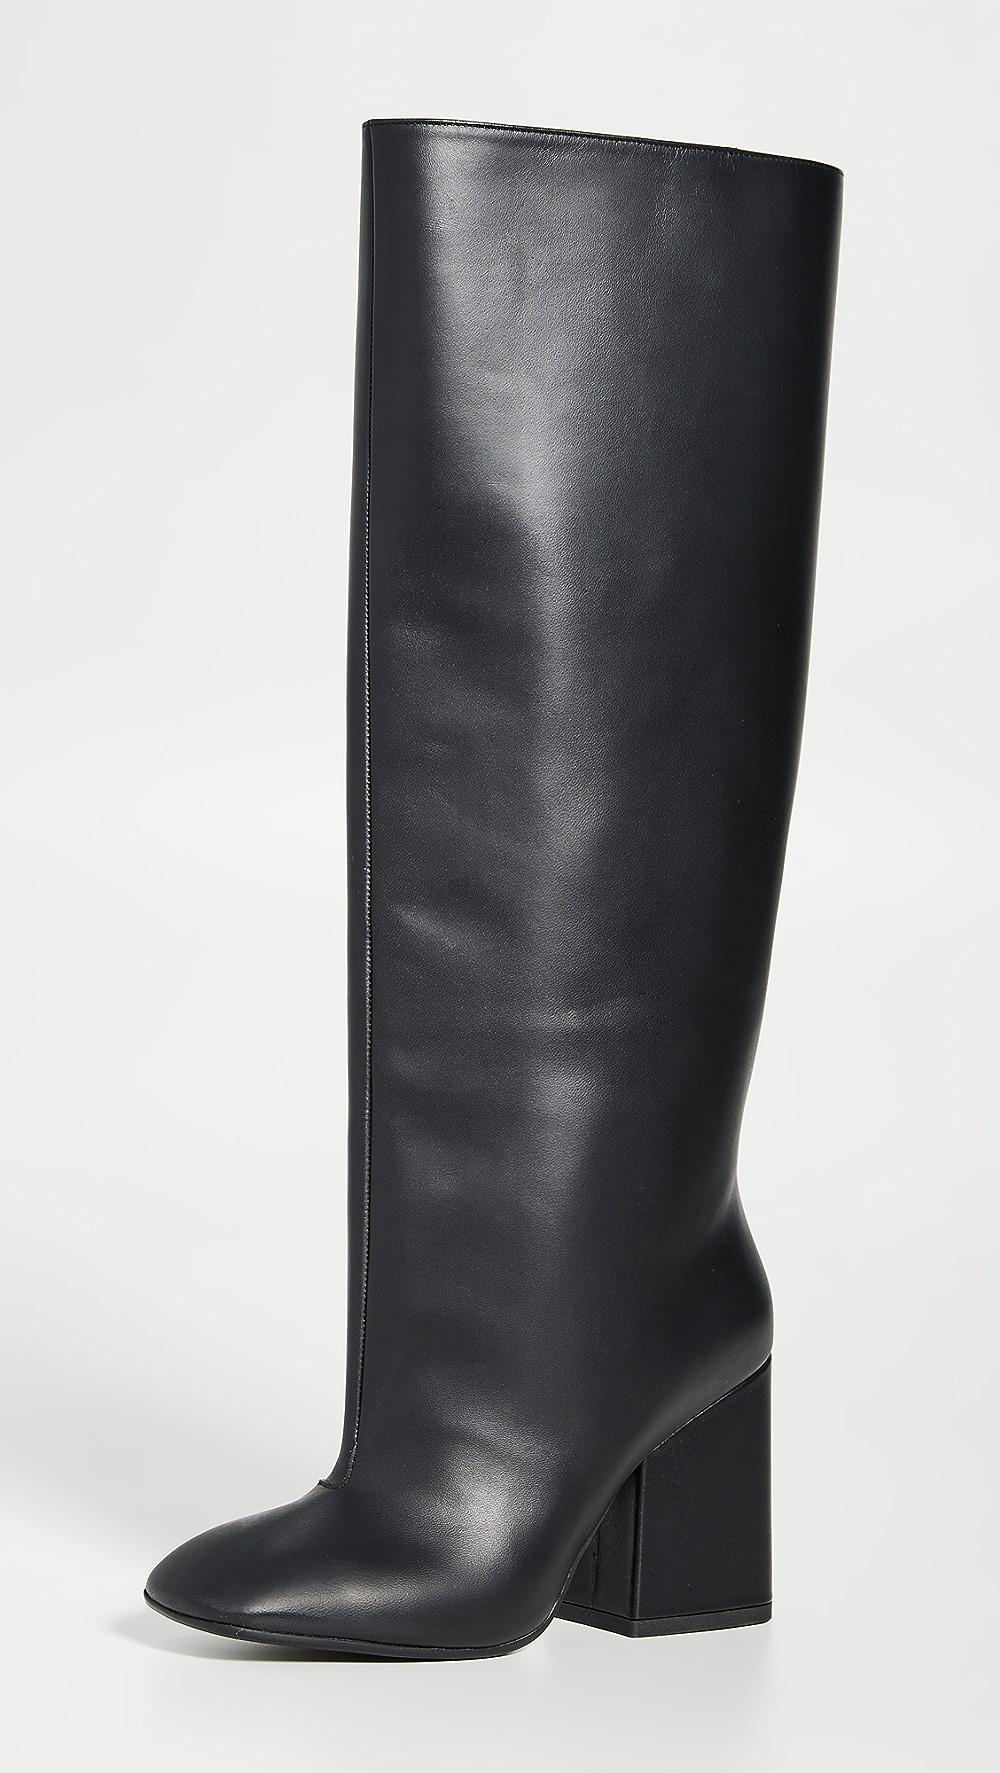 Aspiring Marni - Tall Heeled Boots Refreshing And Enriching The Saliva